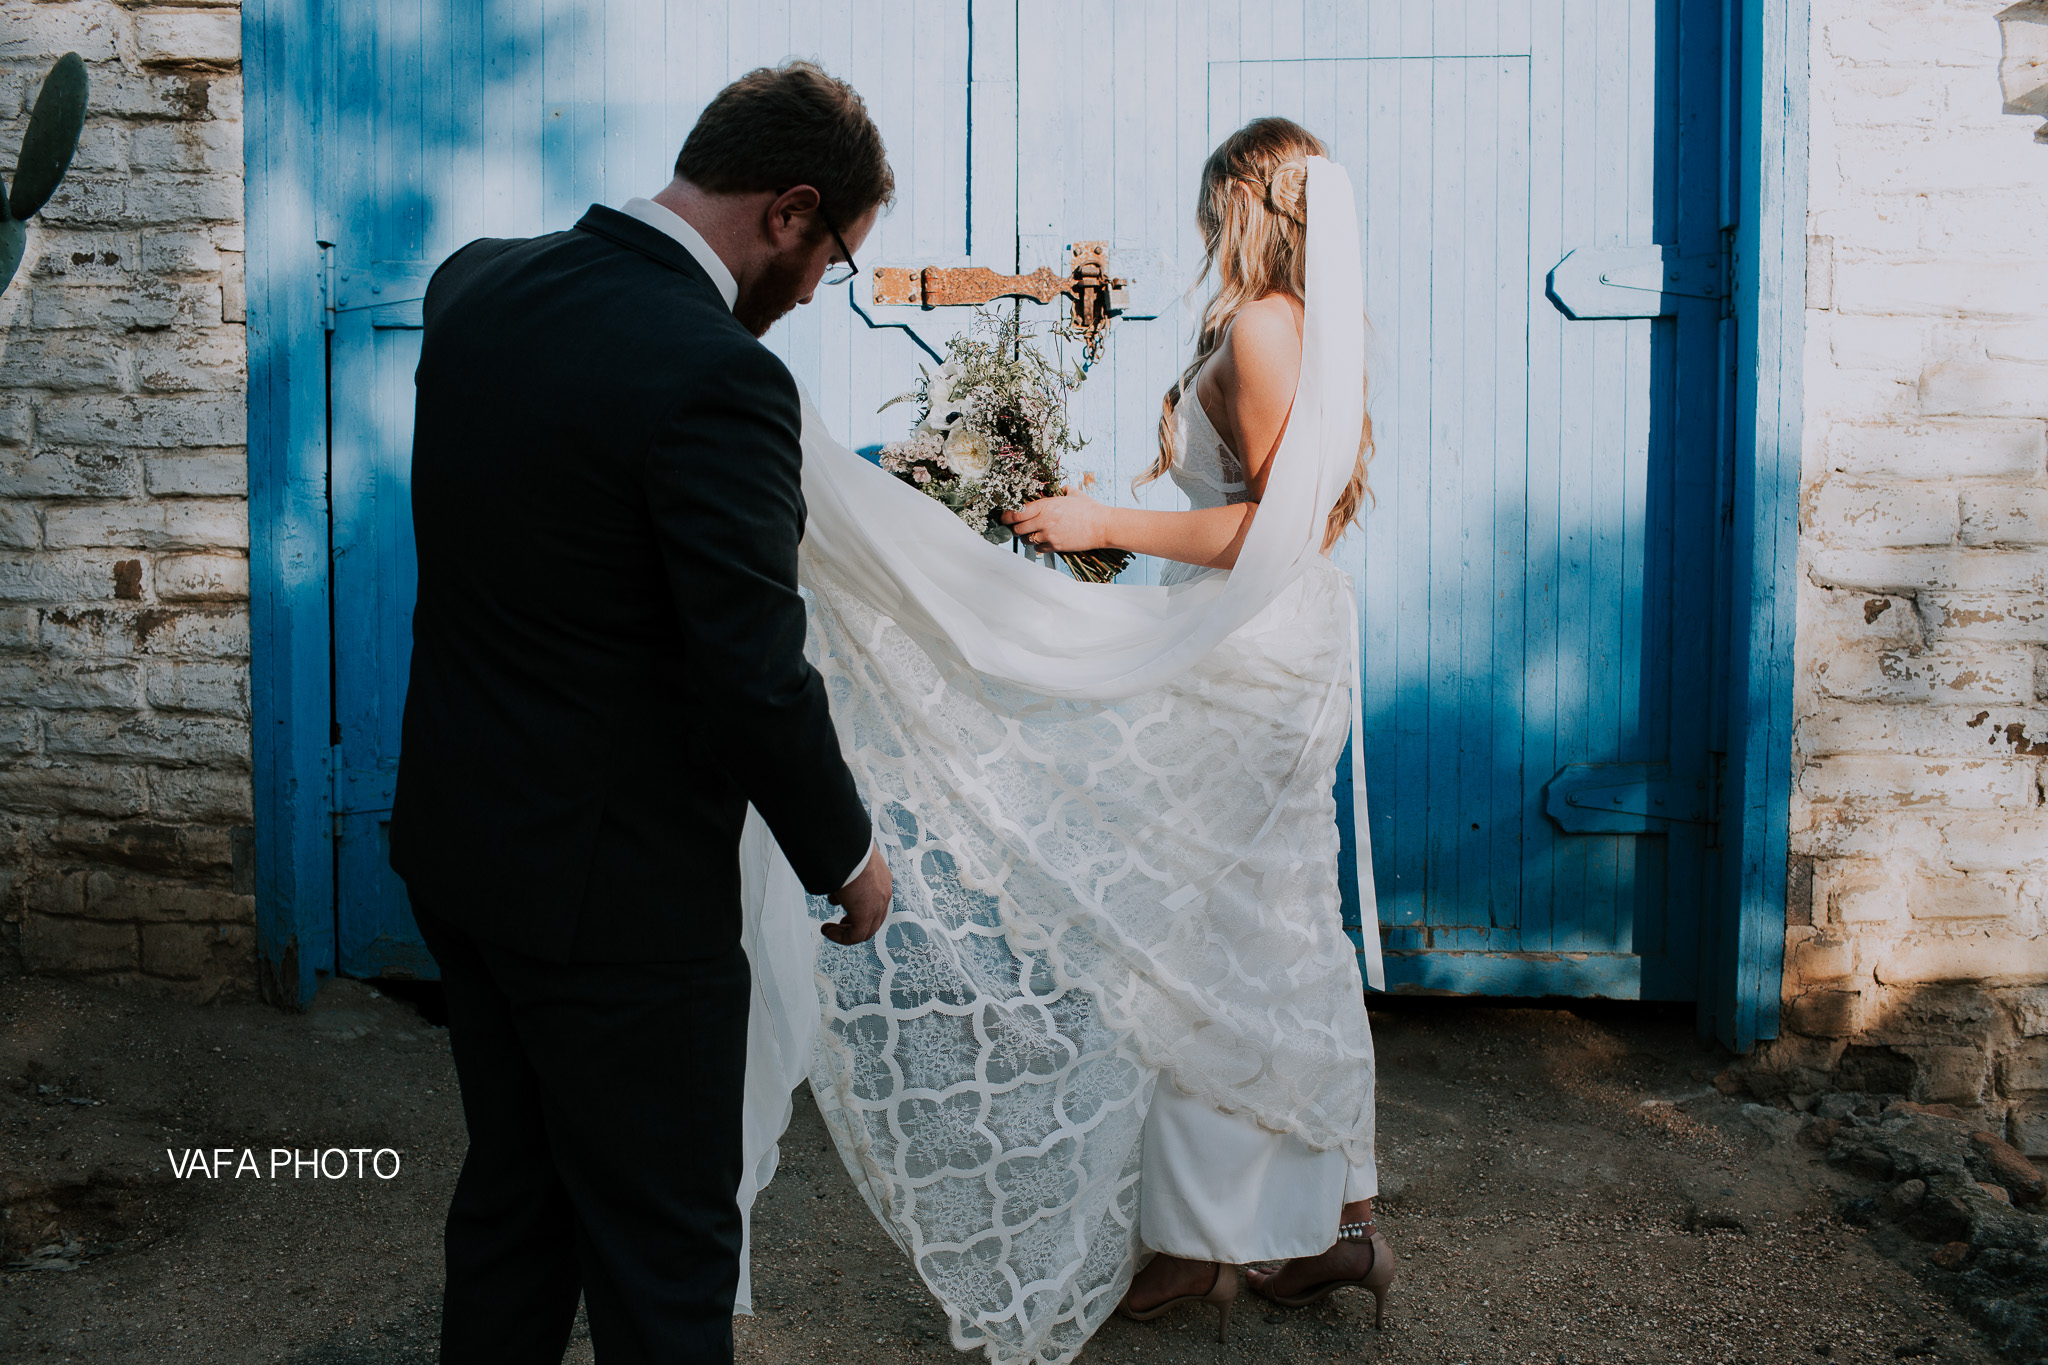 Leo-Carrillo-Ranch-Wedding-Lauren-Mike-Vafa-Photo-699.jpg